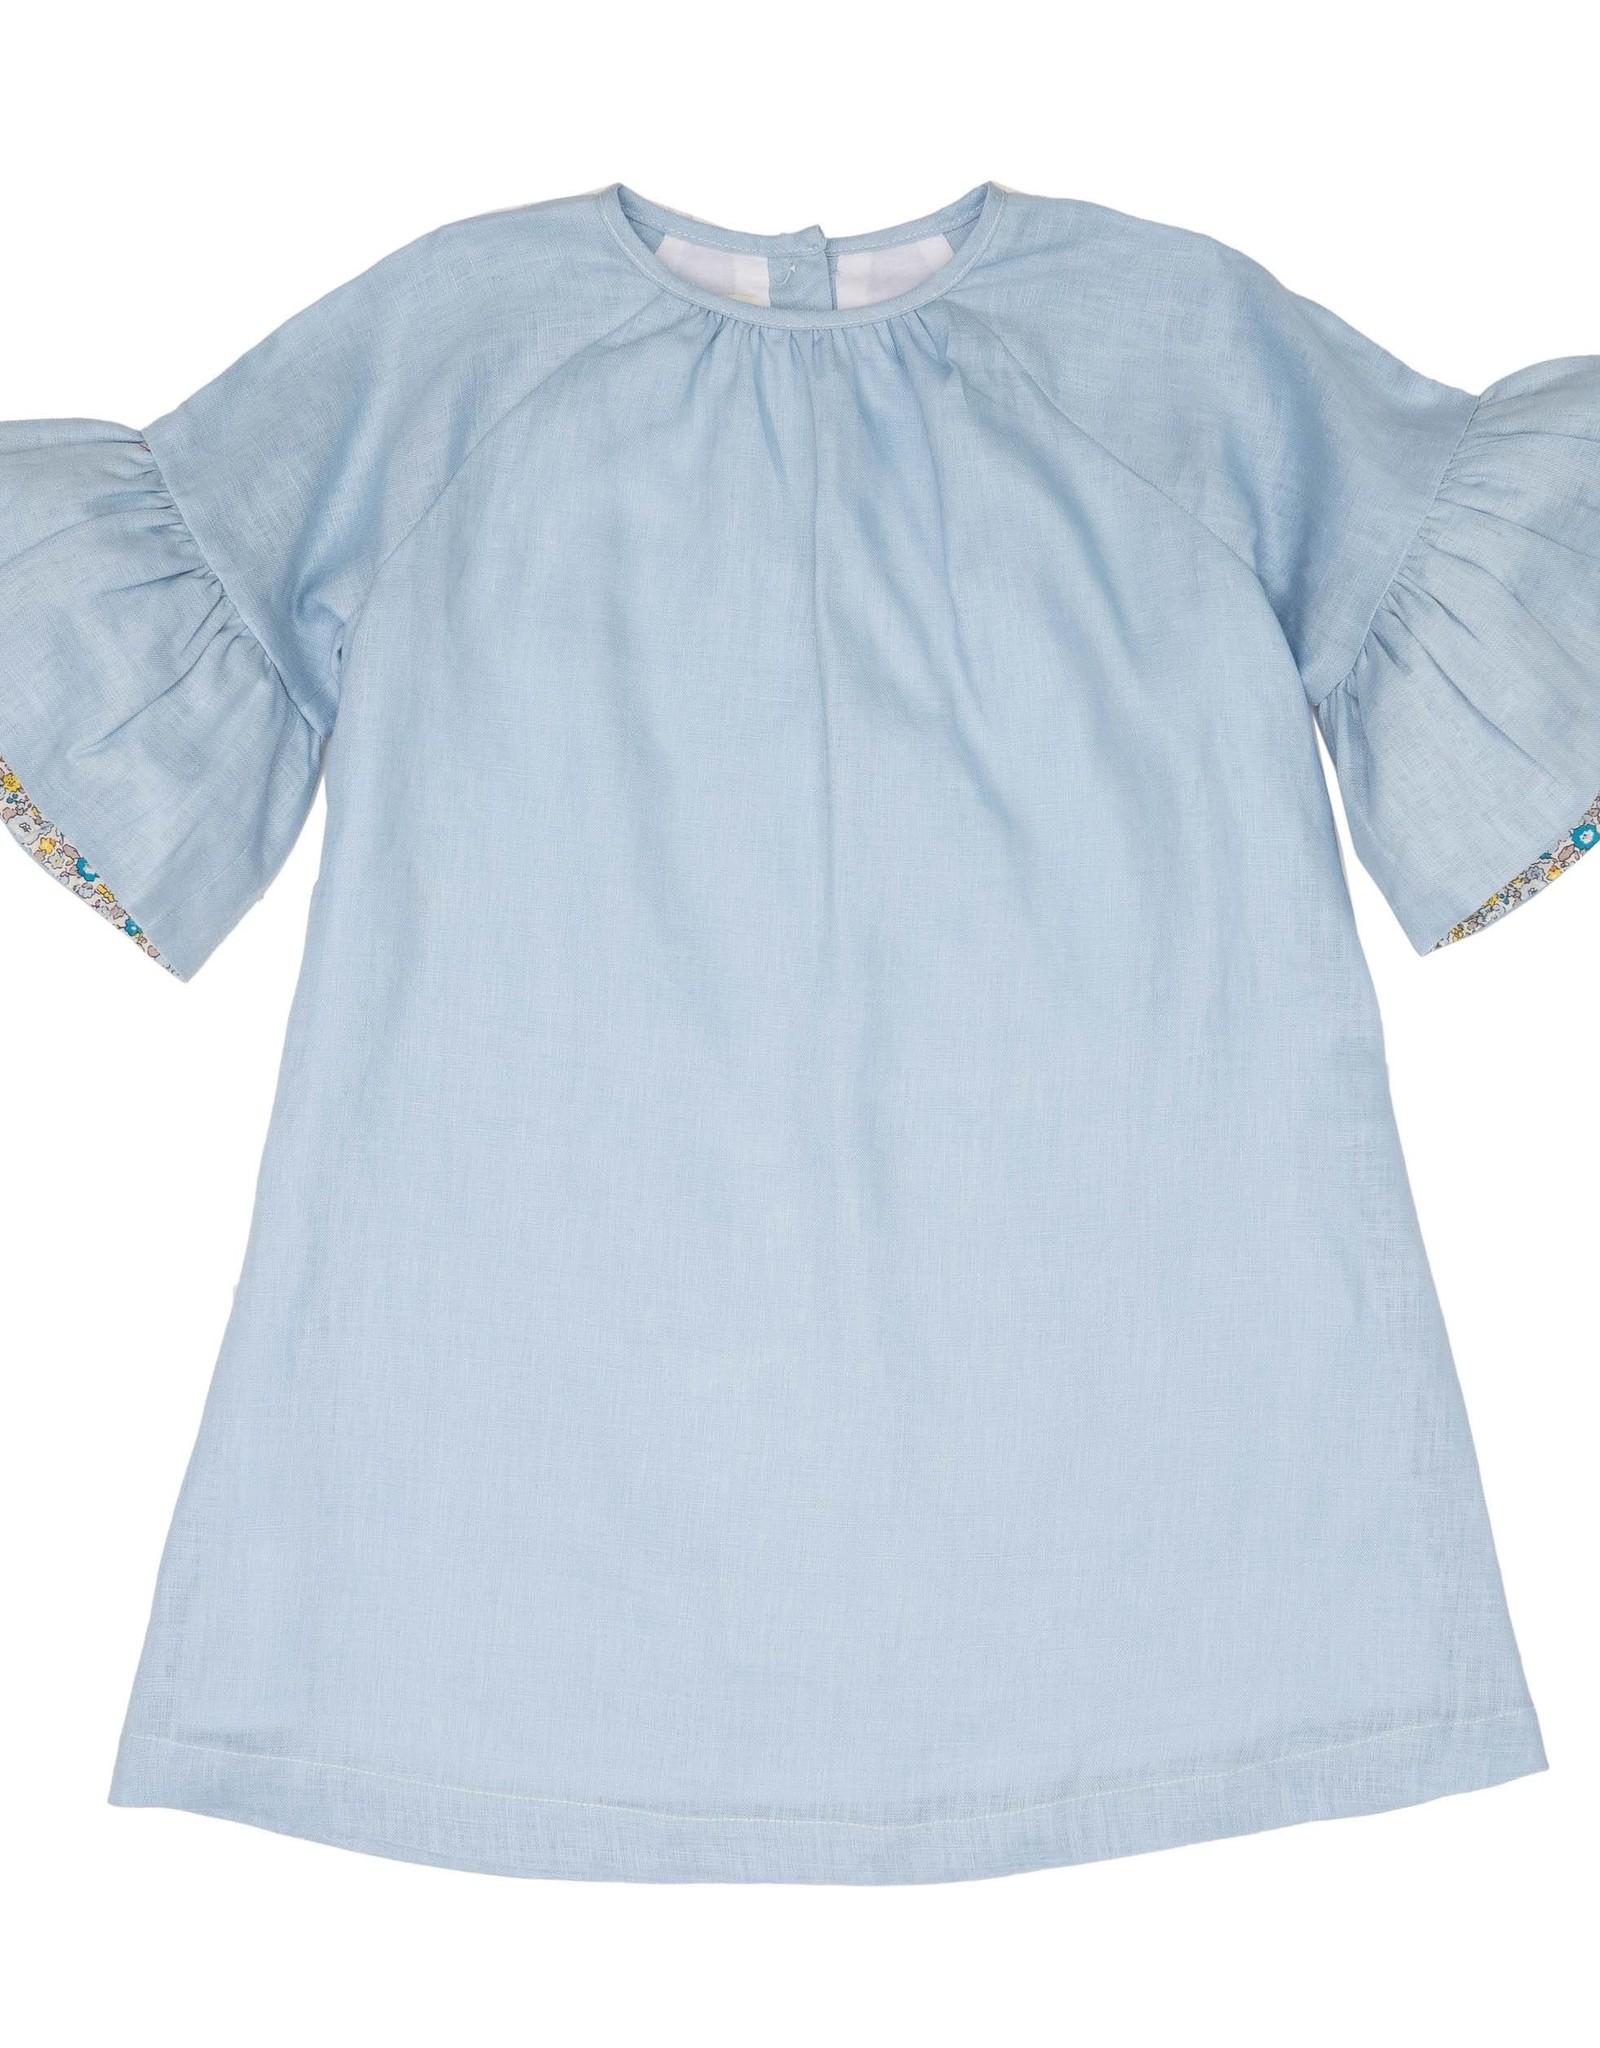 The Oaks Collette Blue Dress